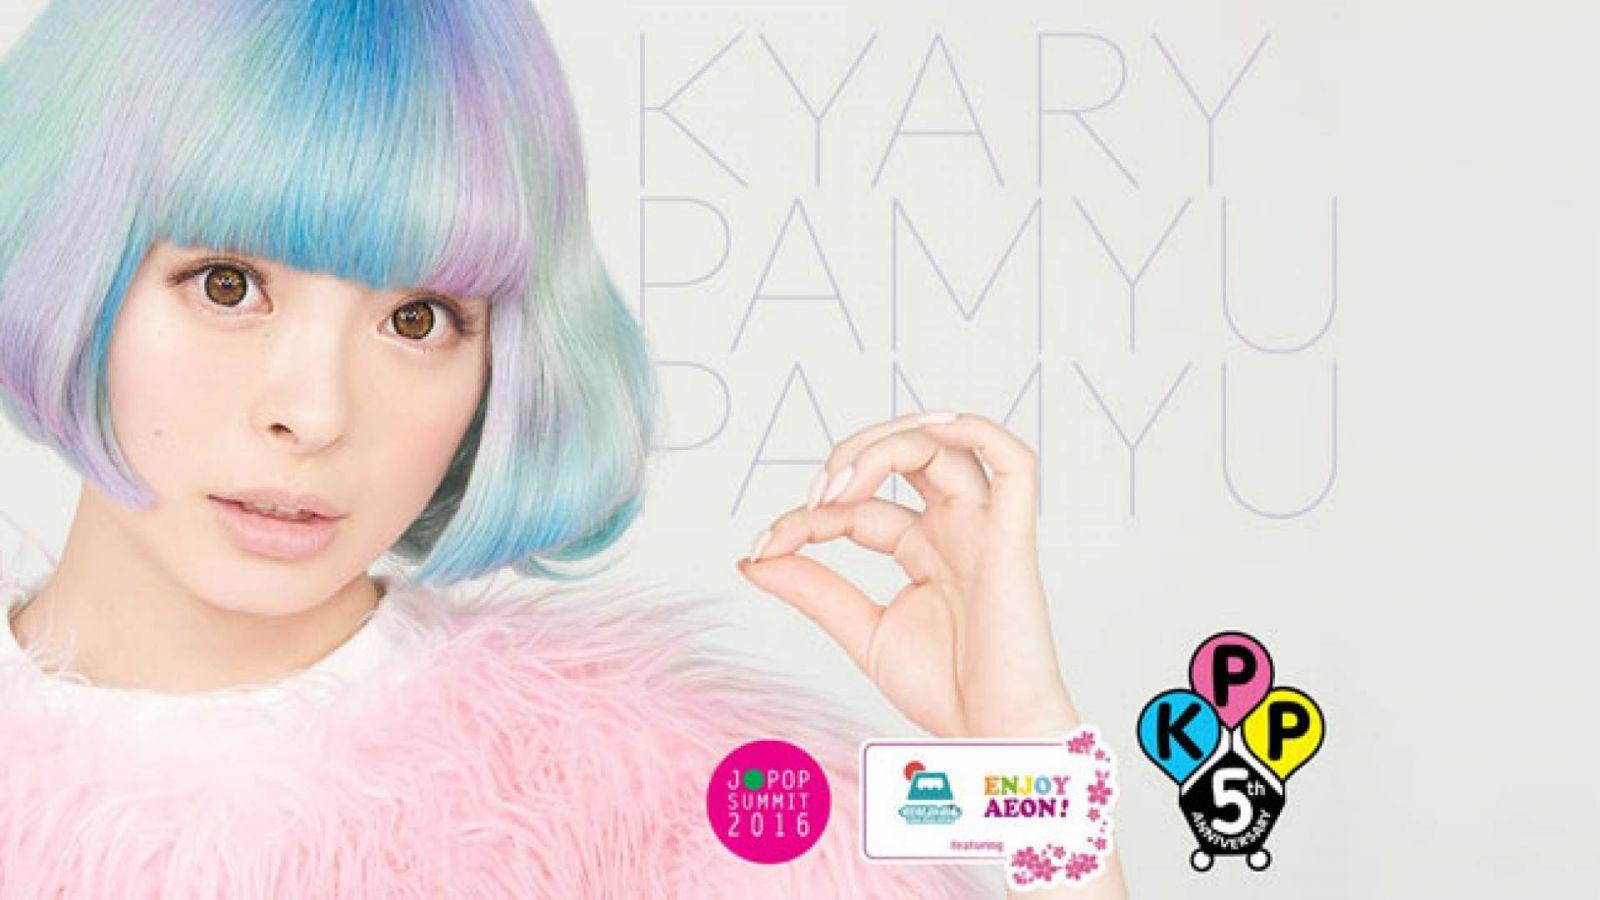 J-POP SUMMIT Announces Opening Live Concert by Kyary Pamyu Pamyu © 2015 ASOBISYSTEMS CO.,LTD